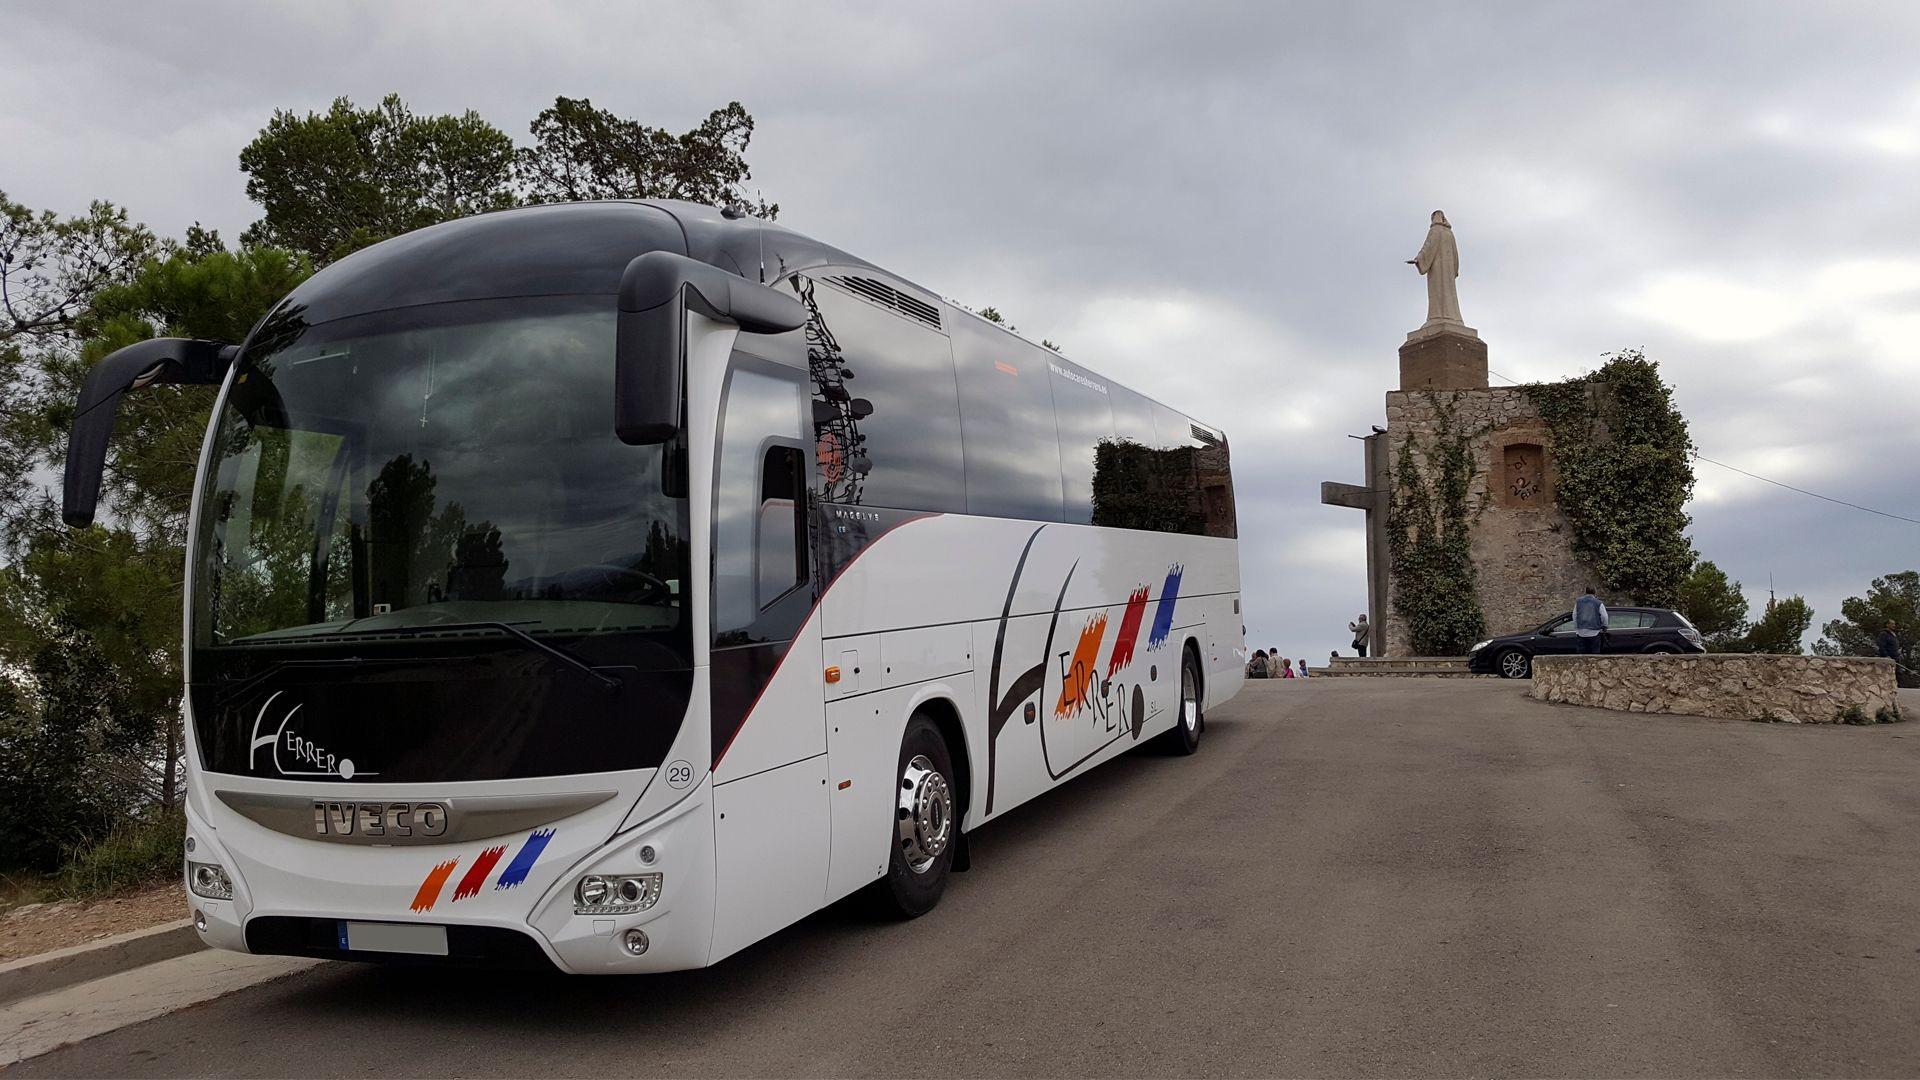 Alquiler de autocares en Palencia